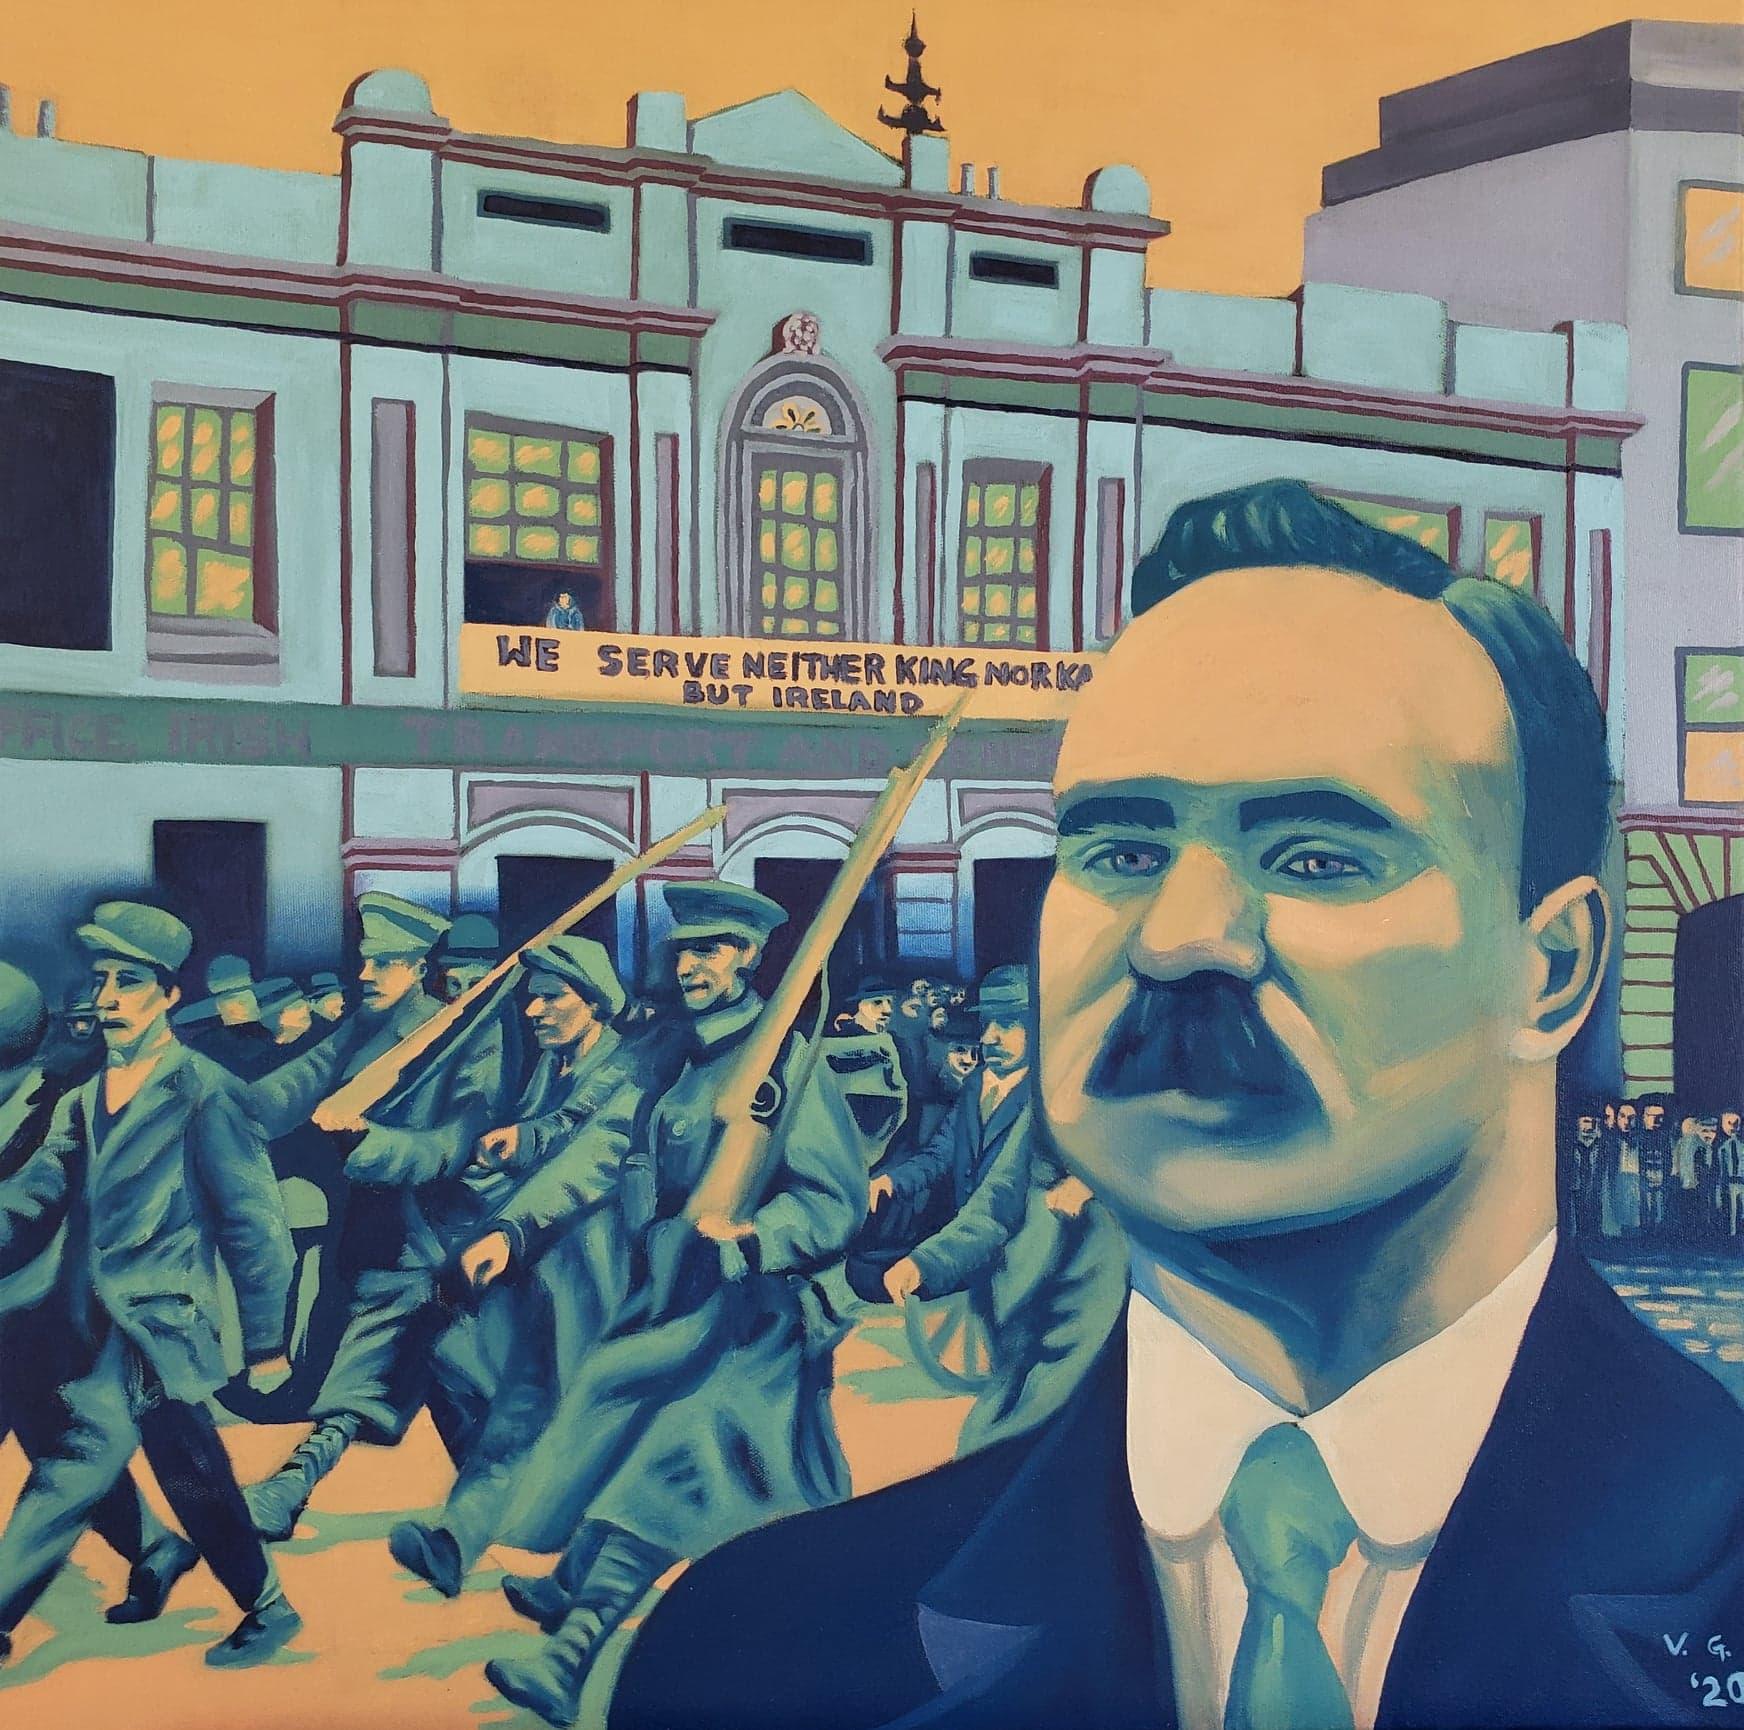 James Connolly: The Irish Uprising